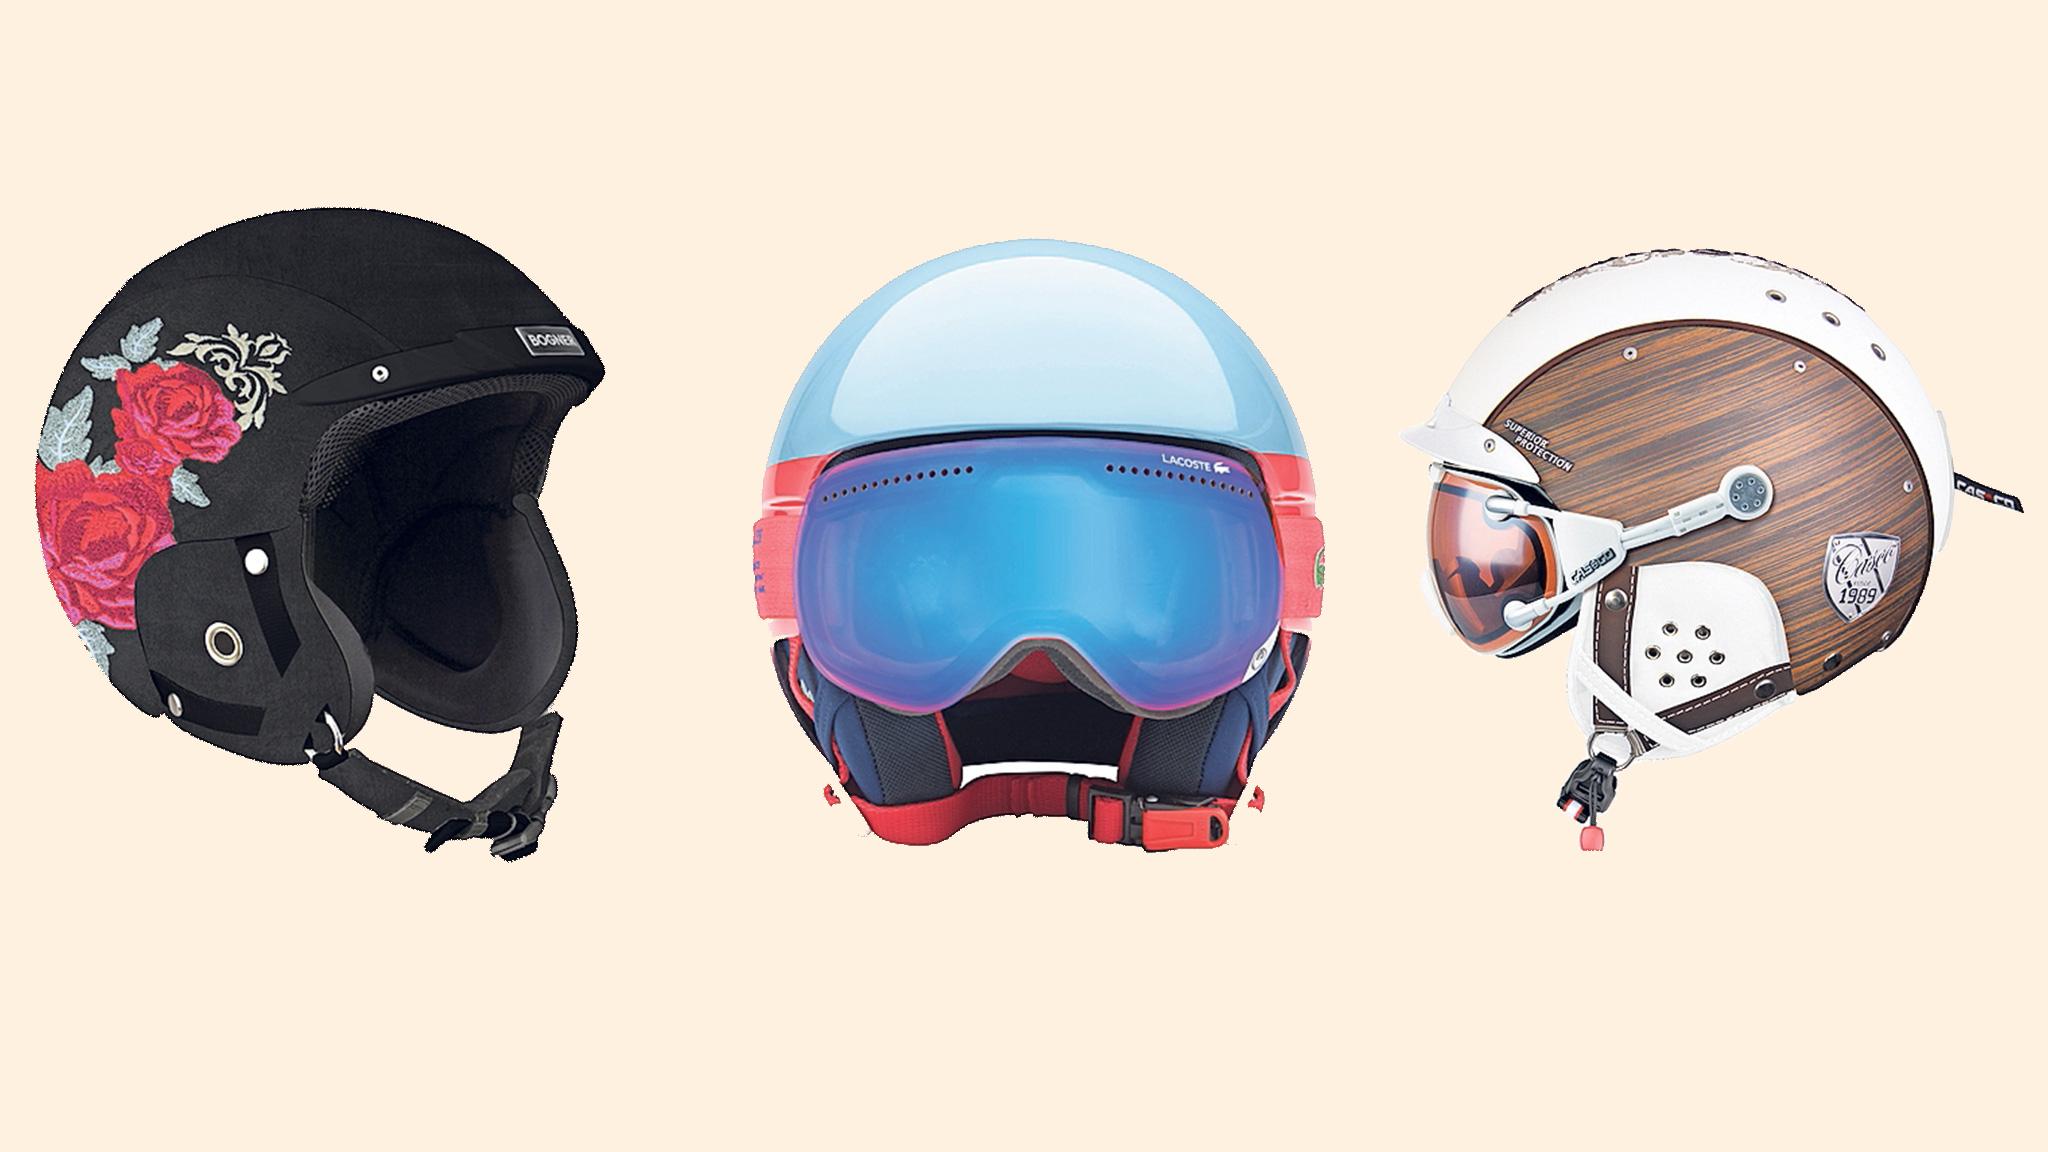 d6b778ba12a Stay safe stay chic with high end ski helmets financial times jpg 2048x1152  Casco winter helmet